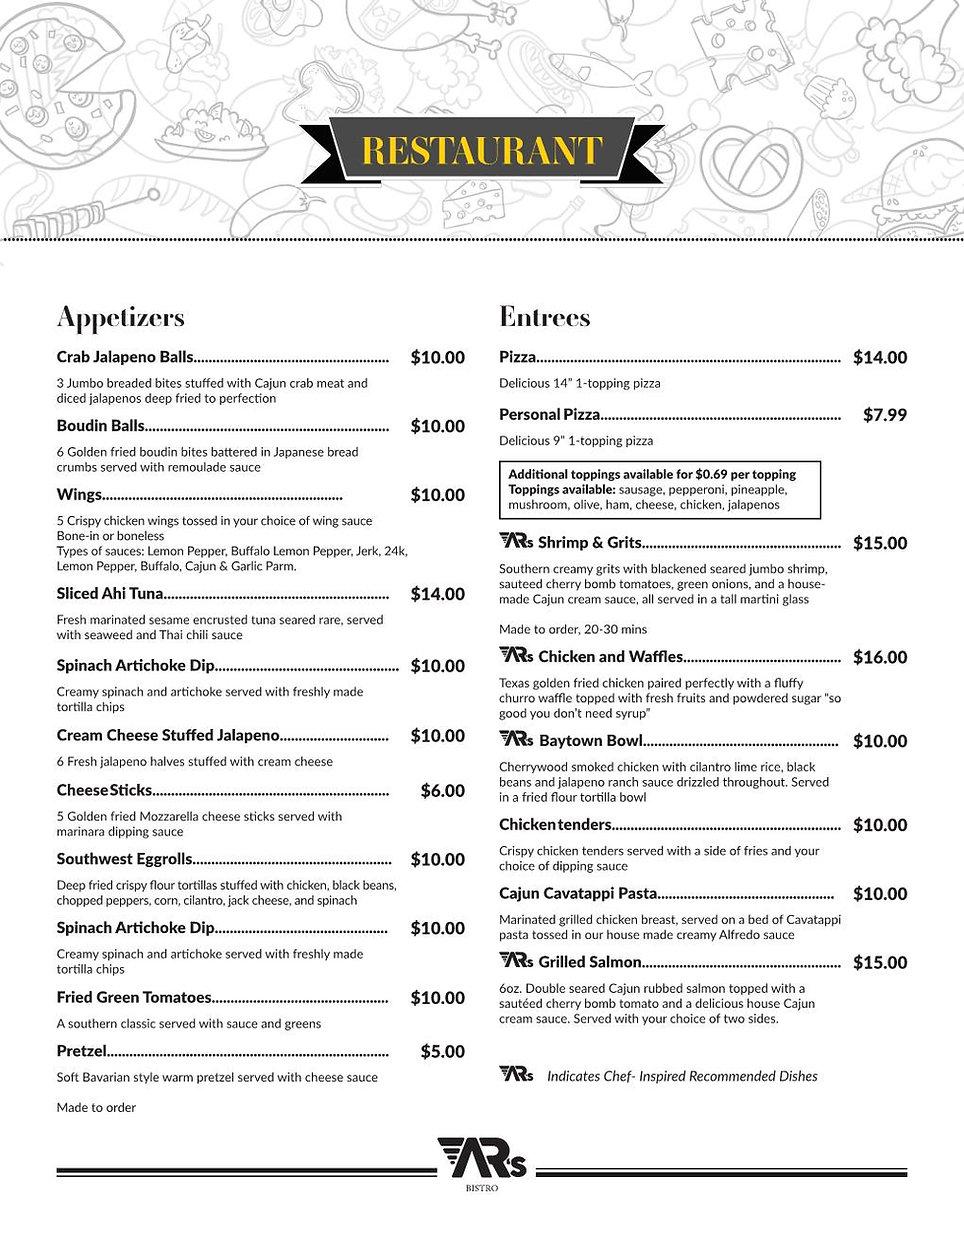 AR_restaurant_MAR-19 Page 002.jpg